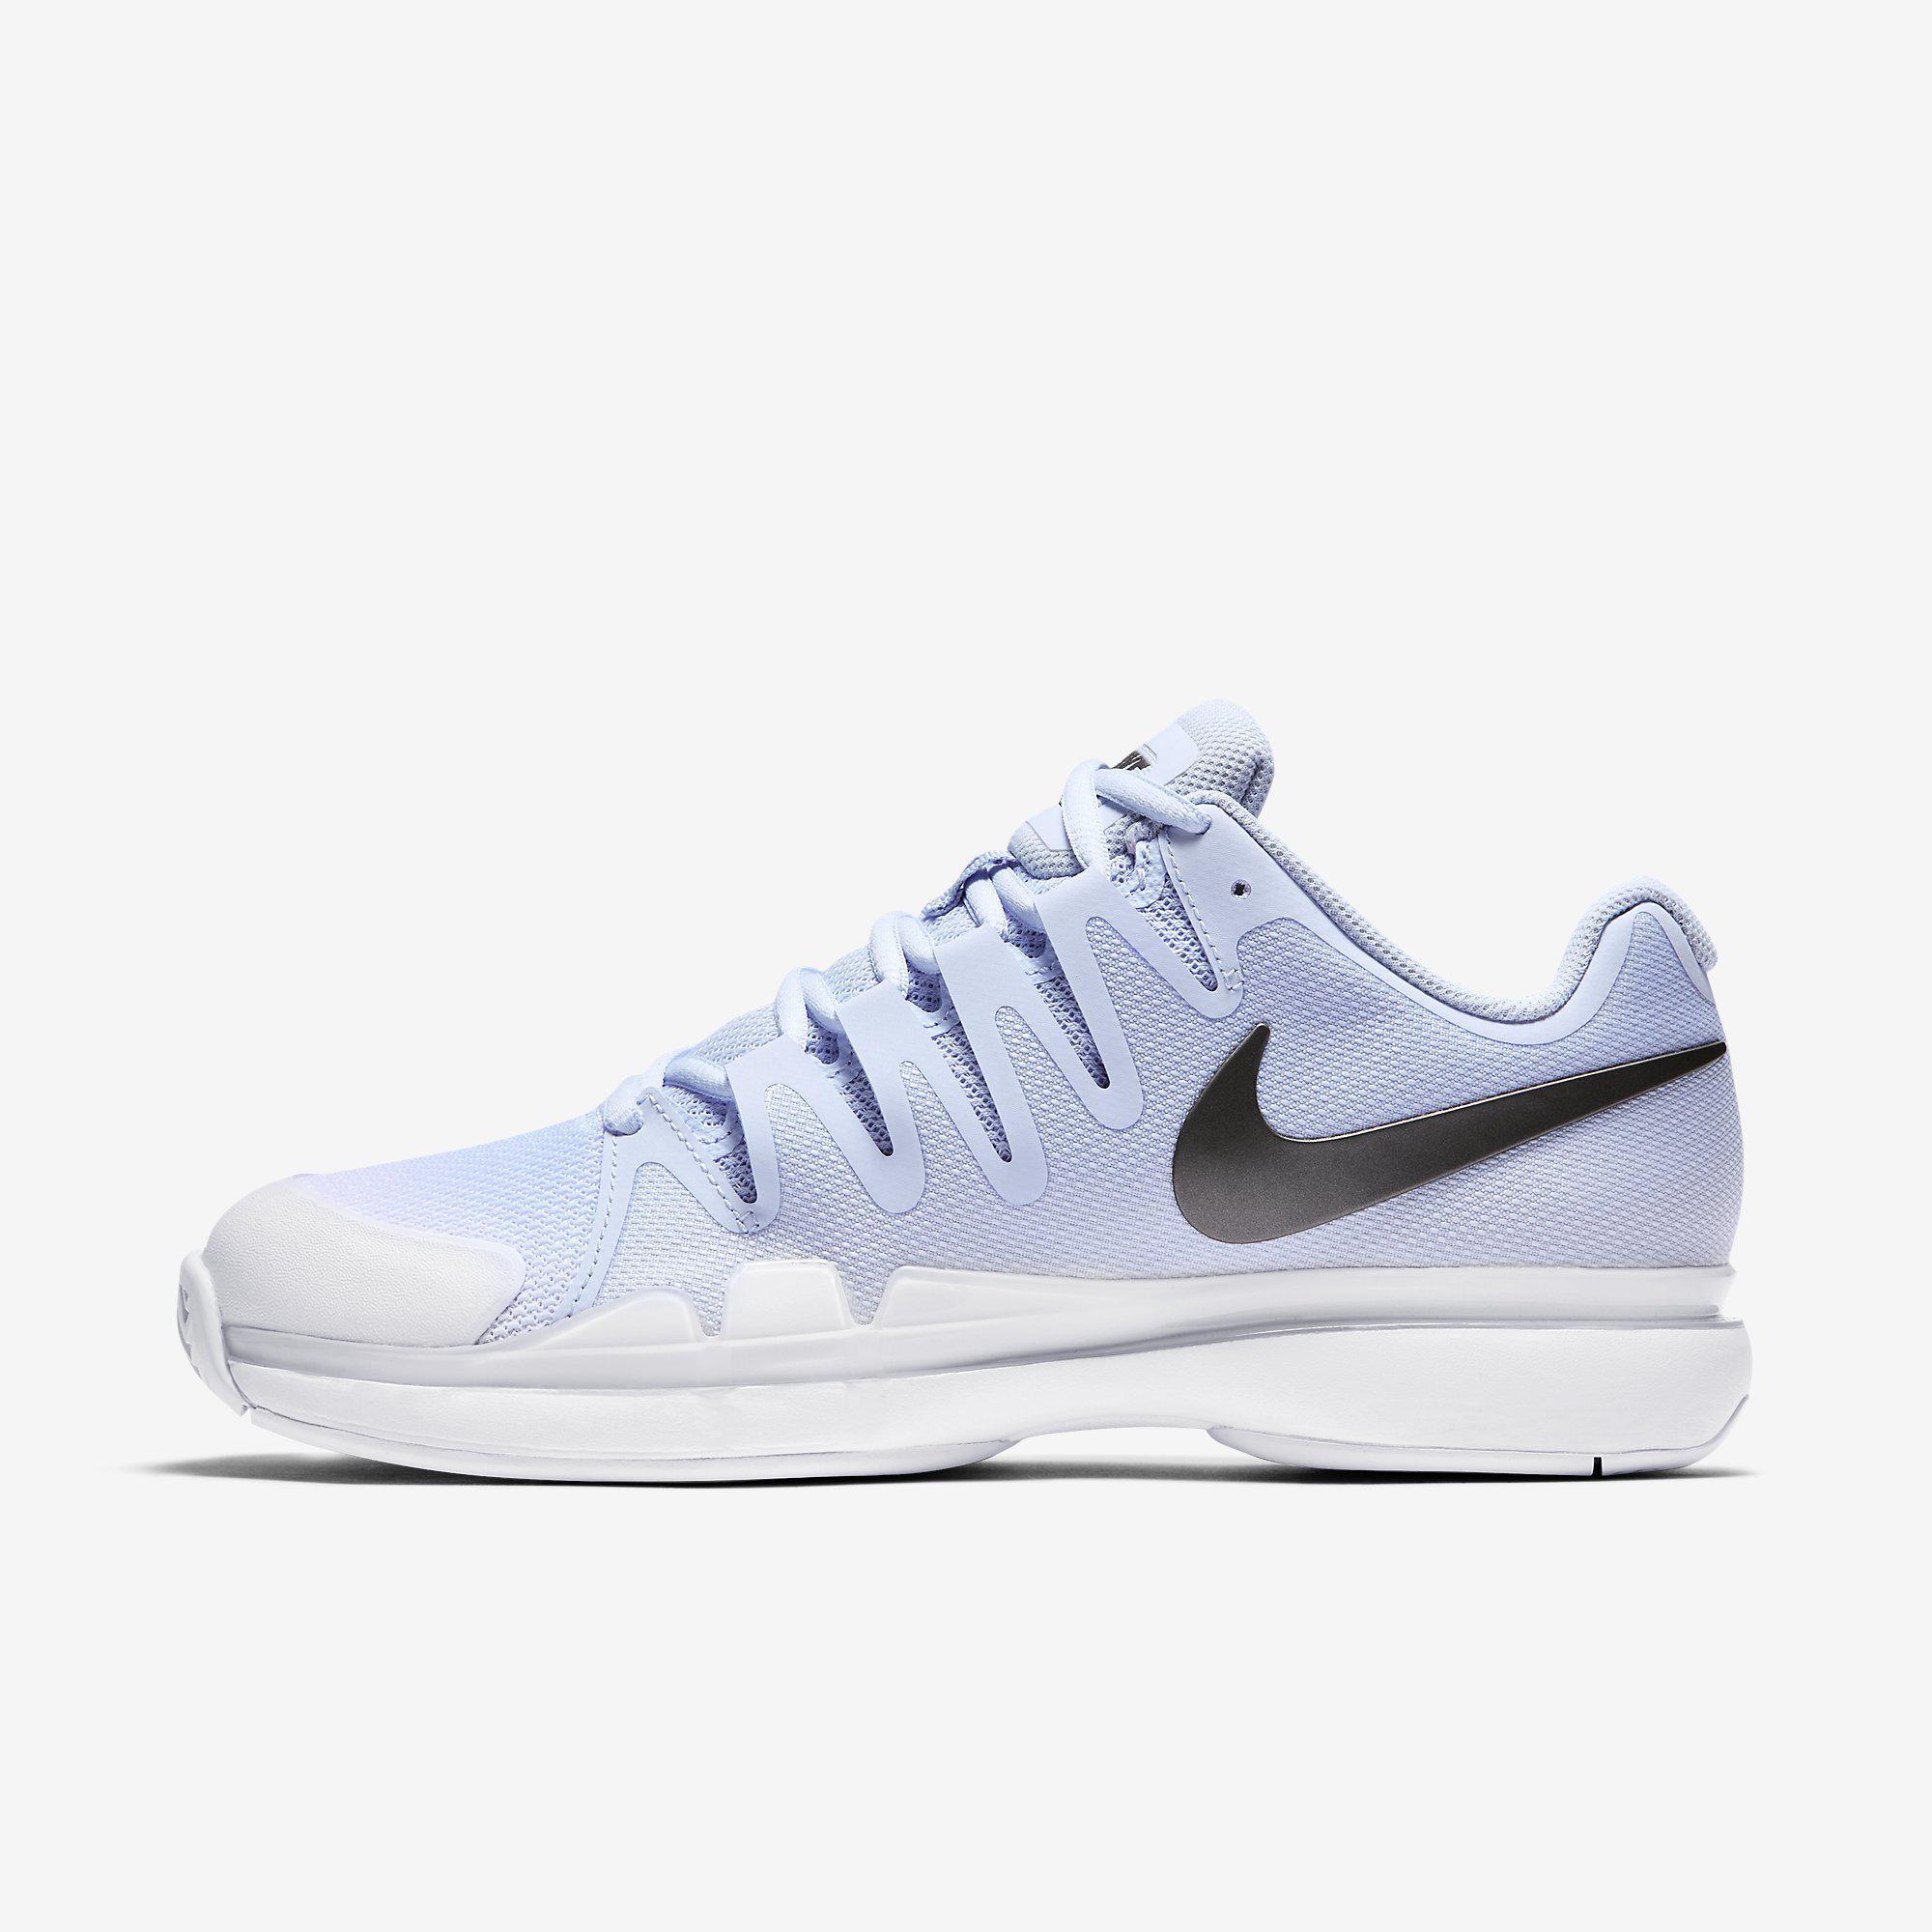 online retailer e430f ccd80 Nike Womens Zoom Vapor 9.5 Tennis Shoes - Hydrogen Blue White -  Tennisnuts.com